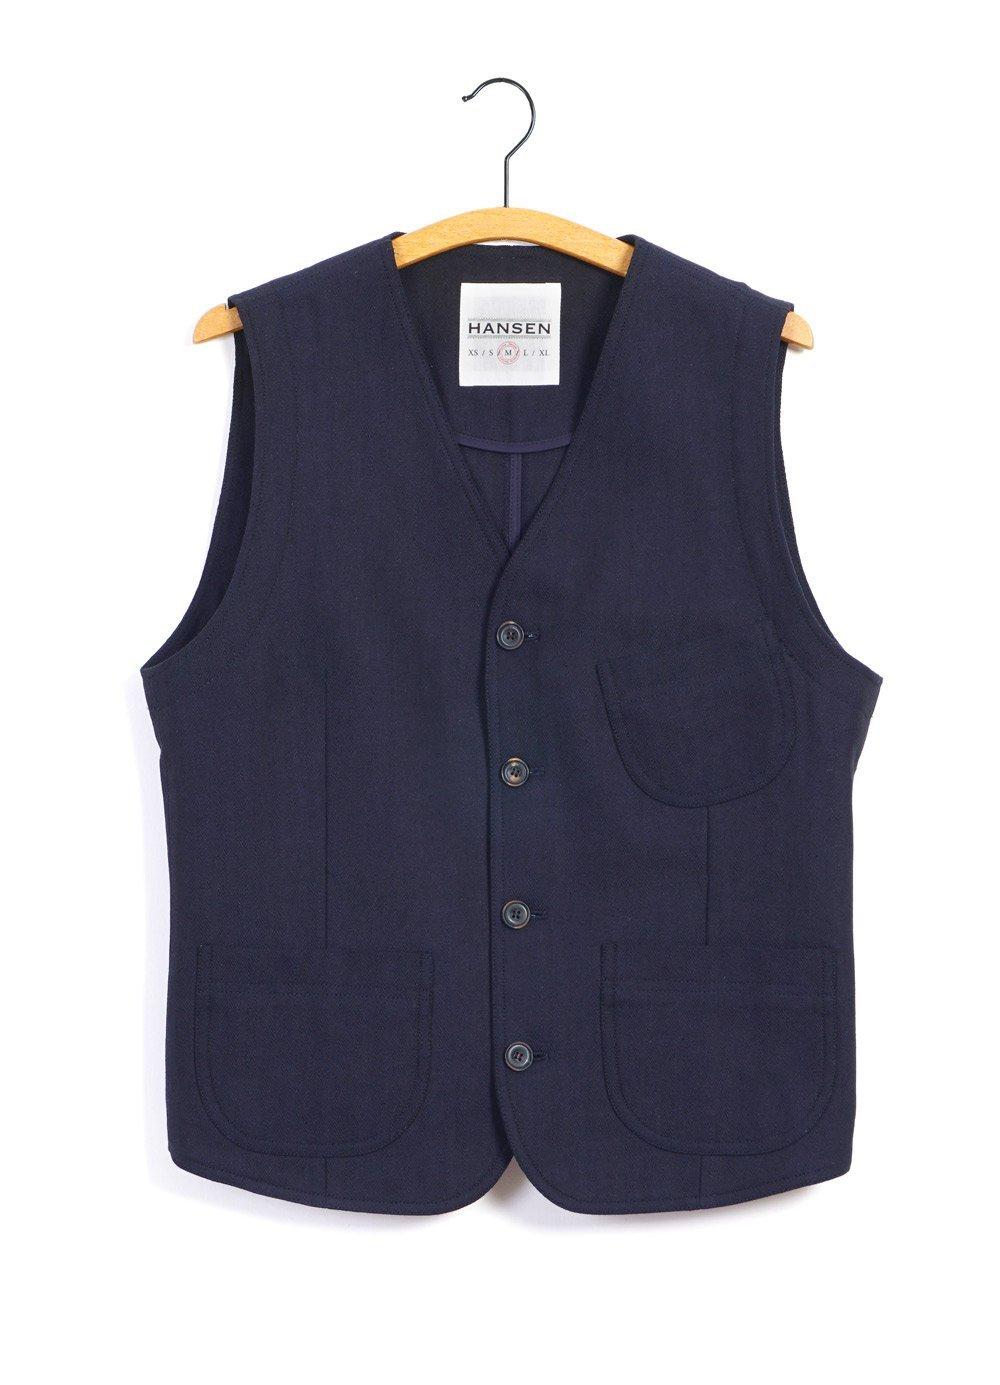 Hansen Garments HARALD | Casual Waistcoat | Indigo